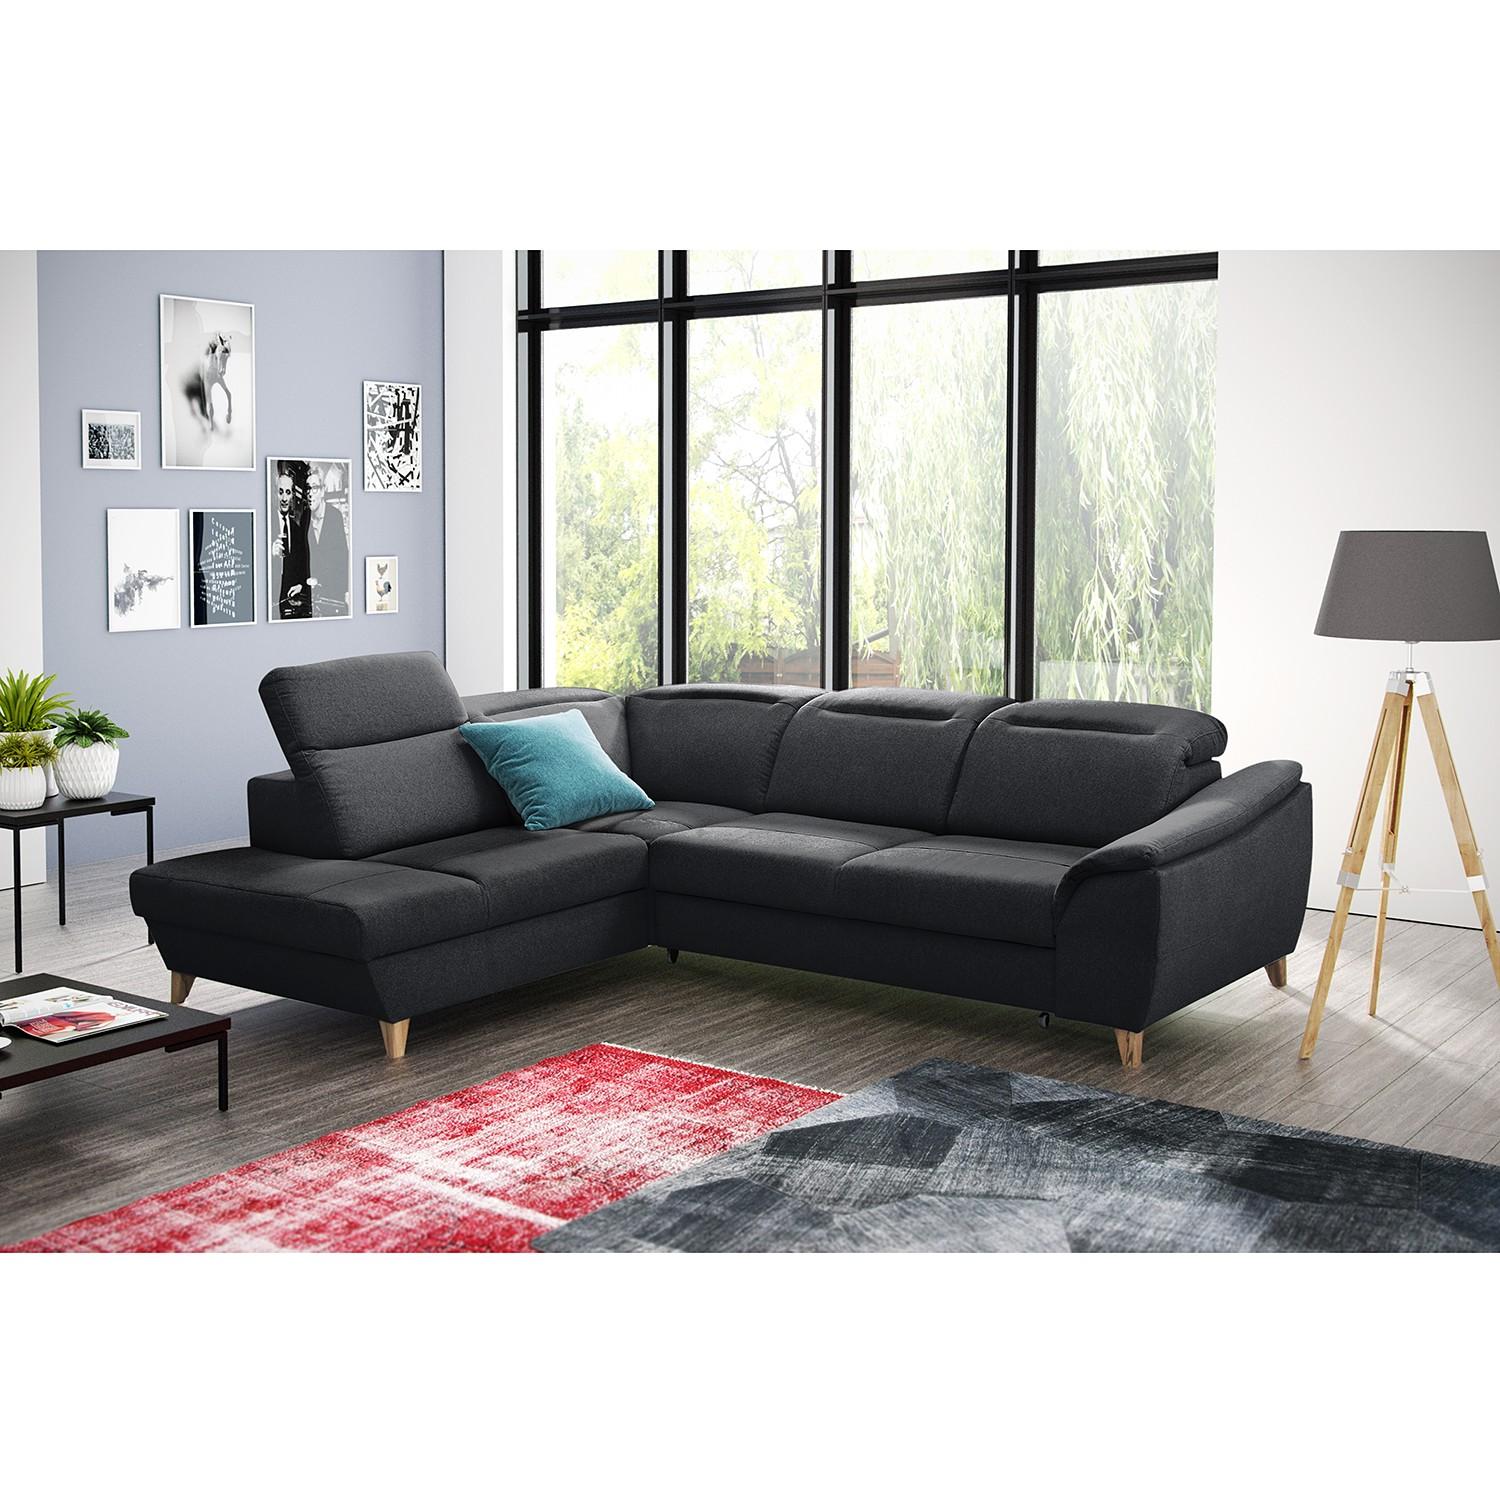 Canapé d'angle Fintel I